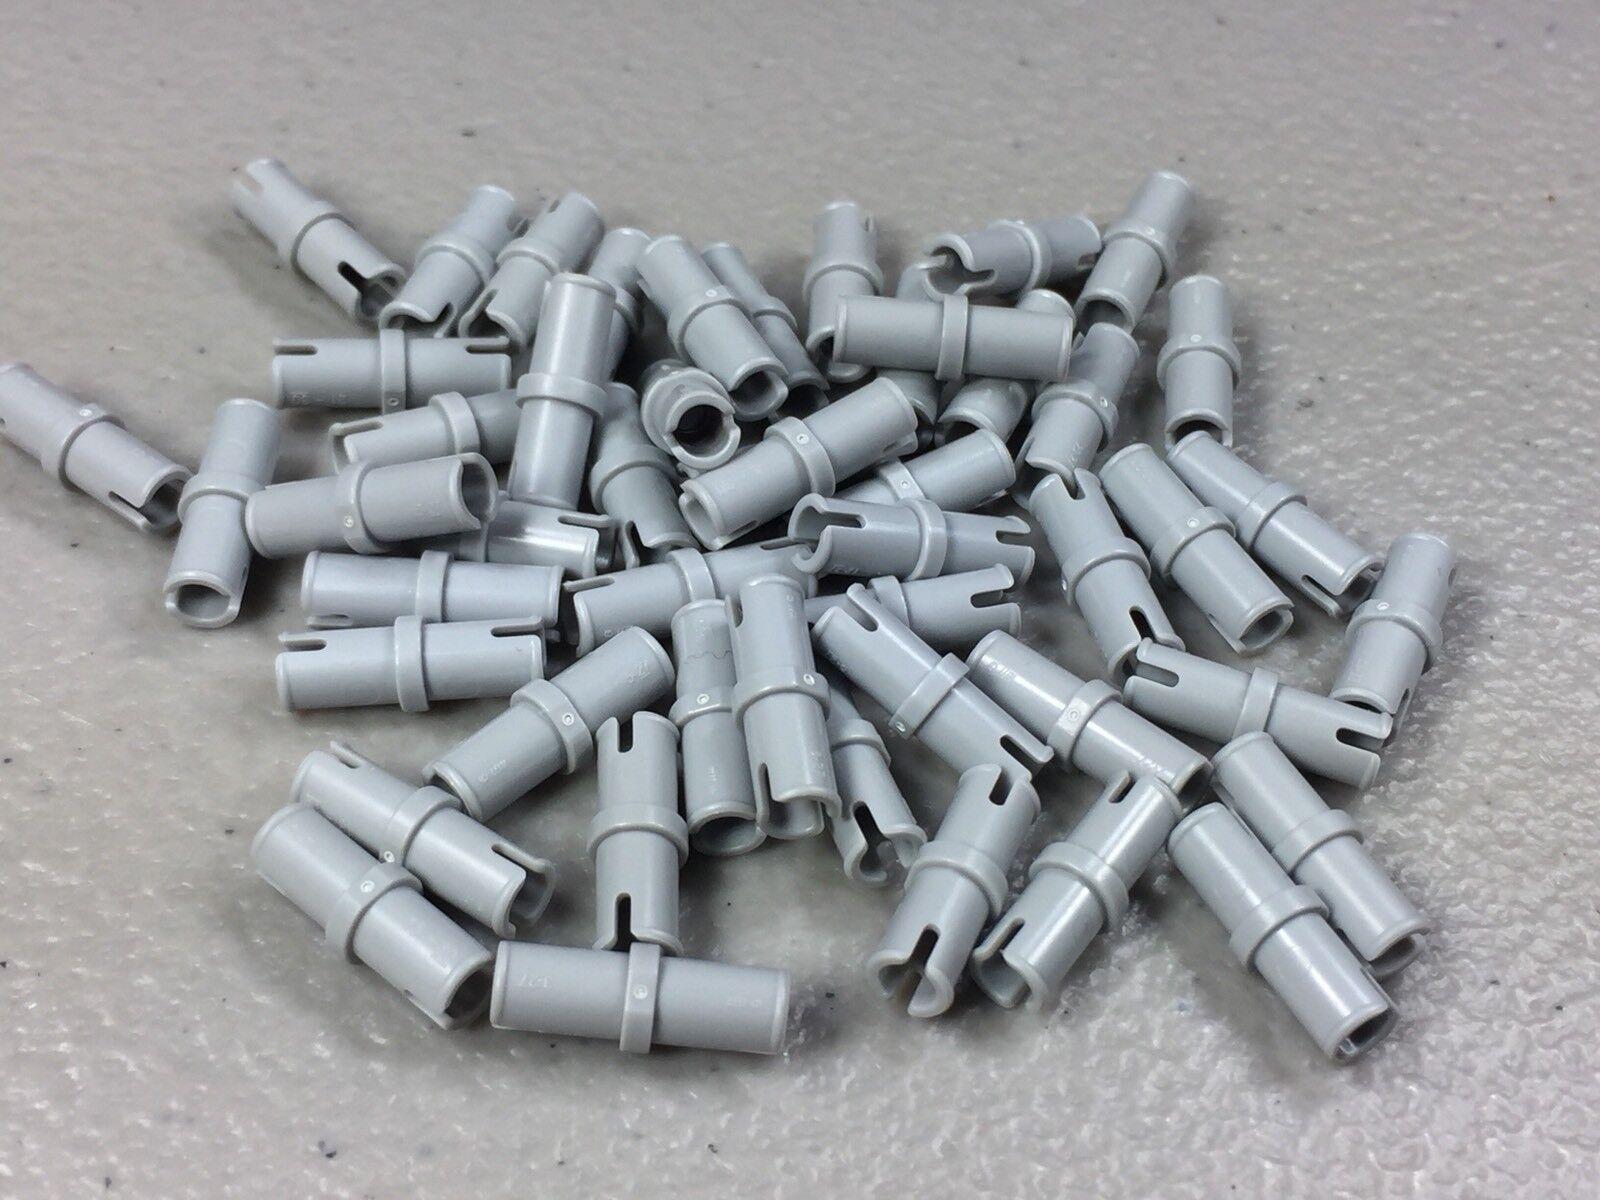 NEUF Lego 32054-10x Brique // Technic Pin 3L friction ridges Gray Light B